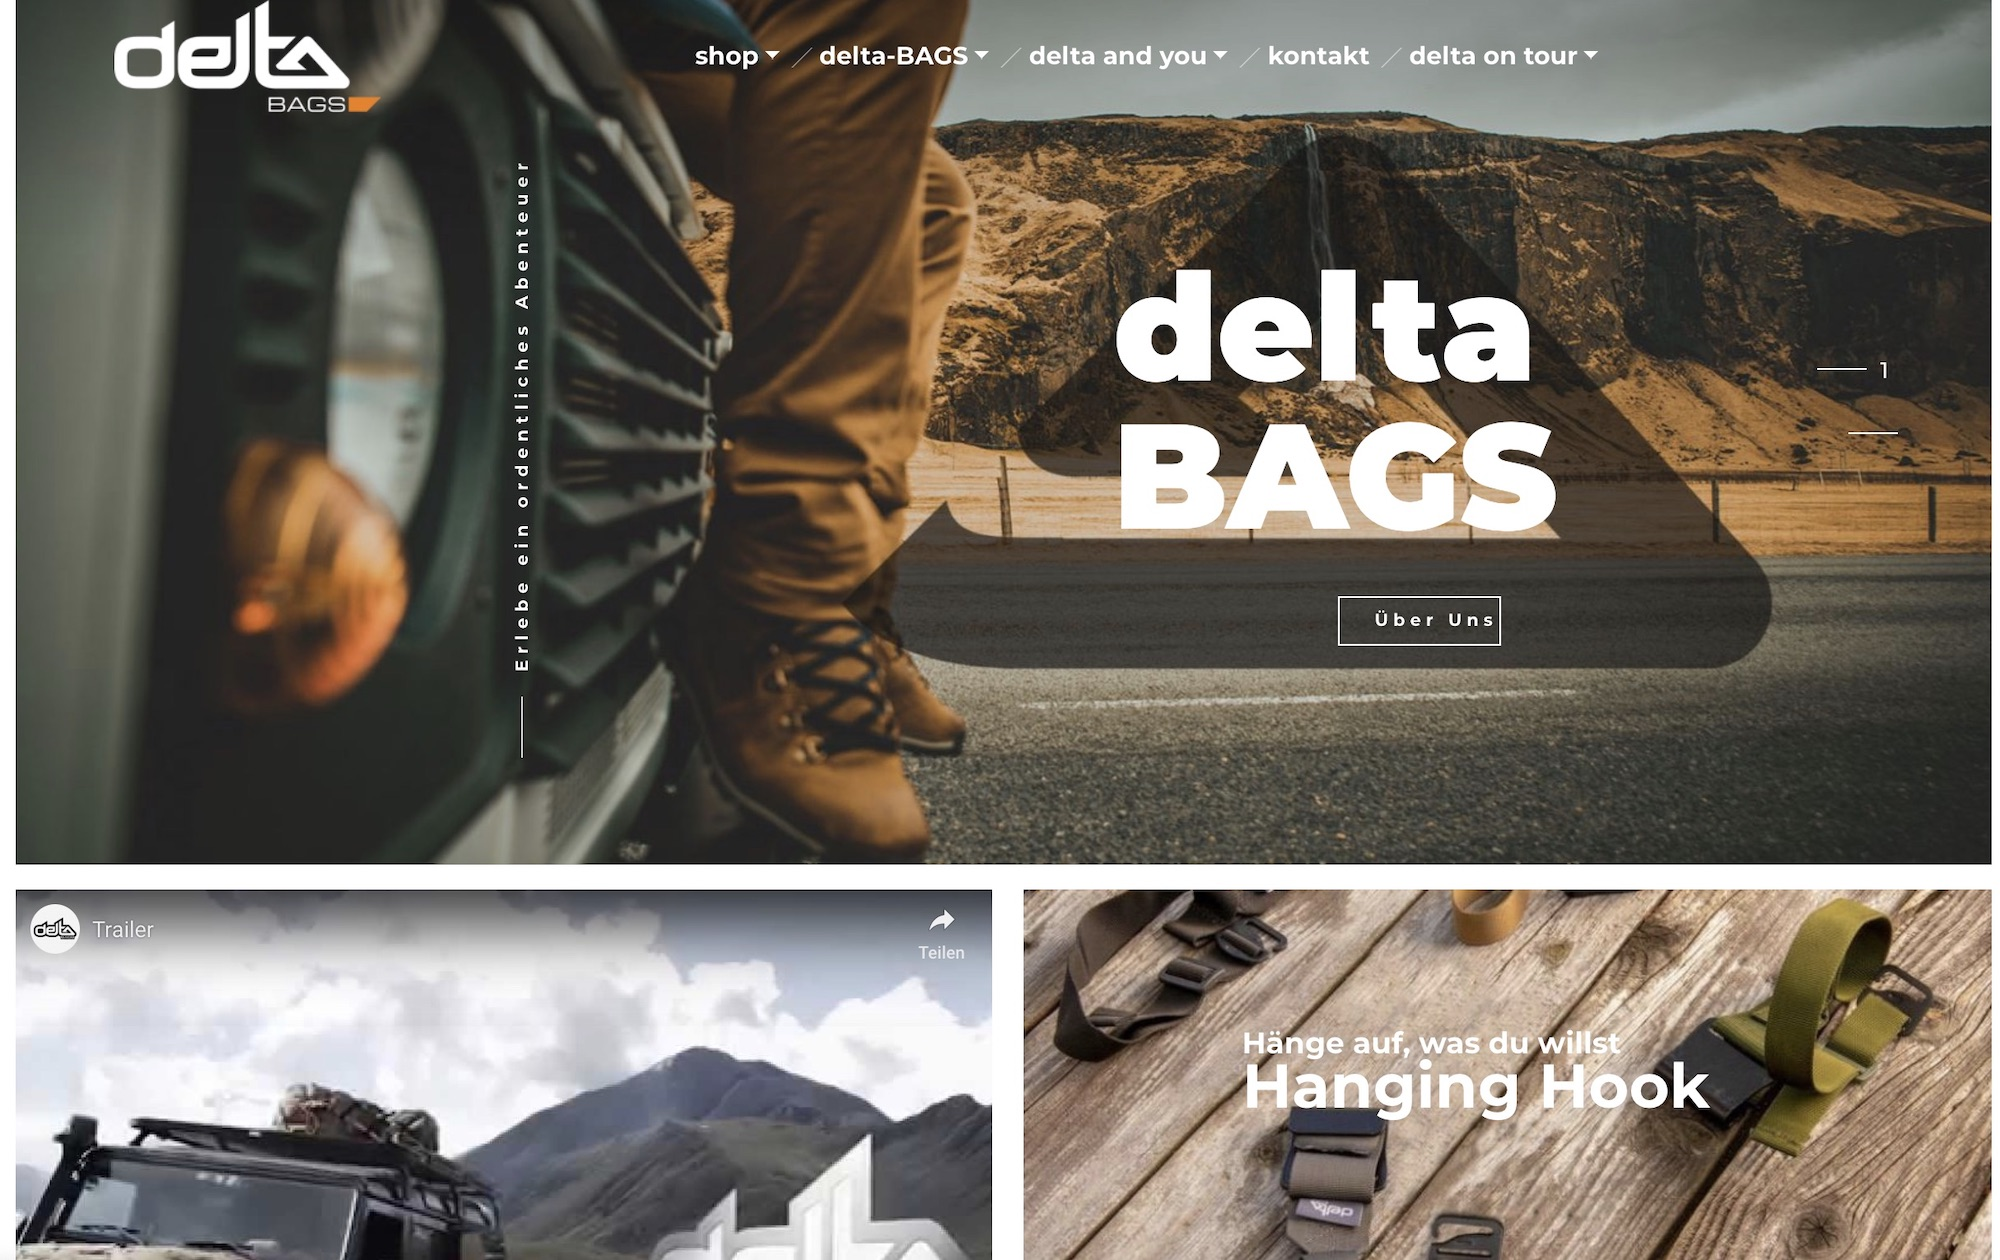 delta-BAGS neuer Online-Shop